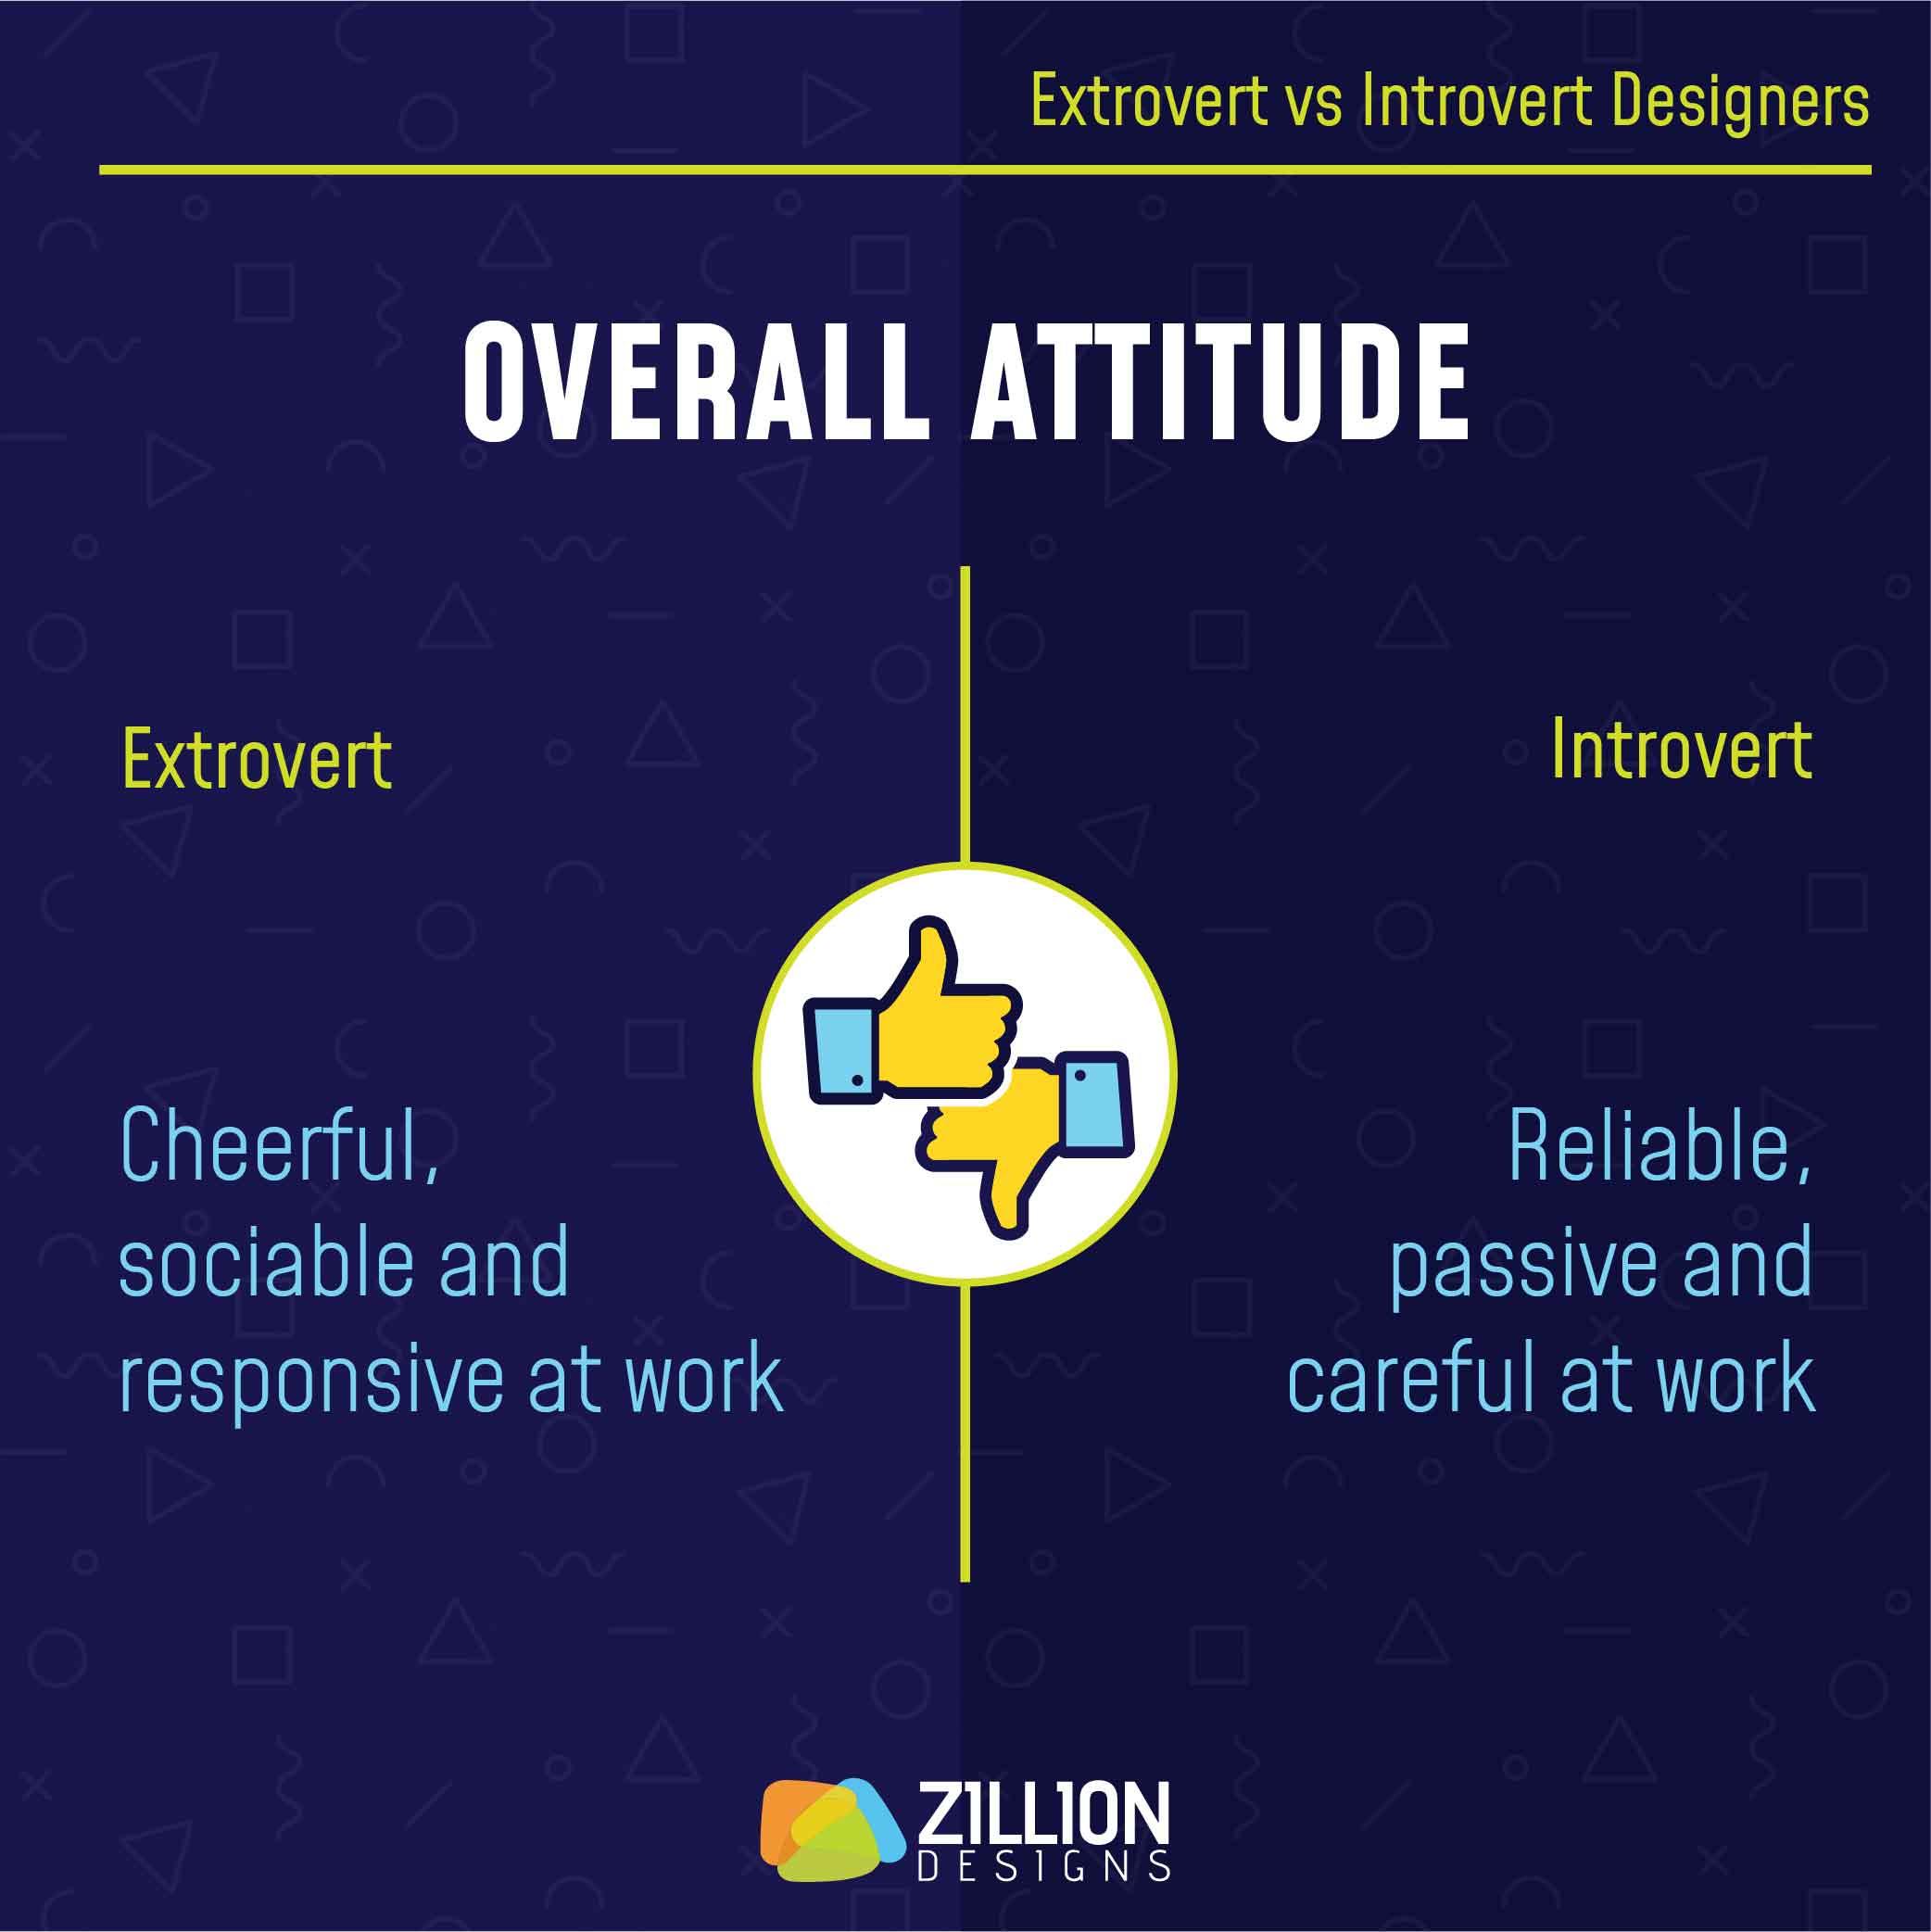 Extrovert vs Introvert Designers 9